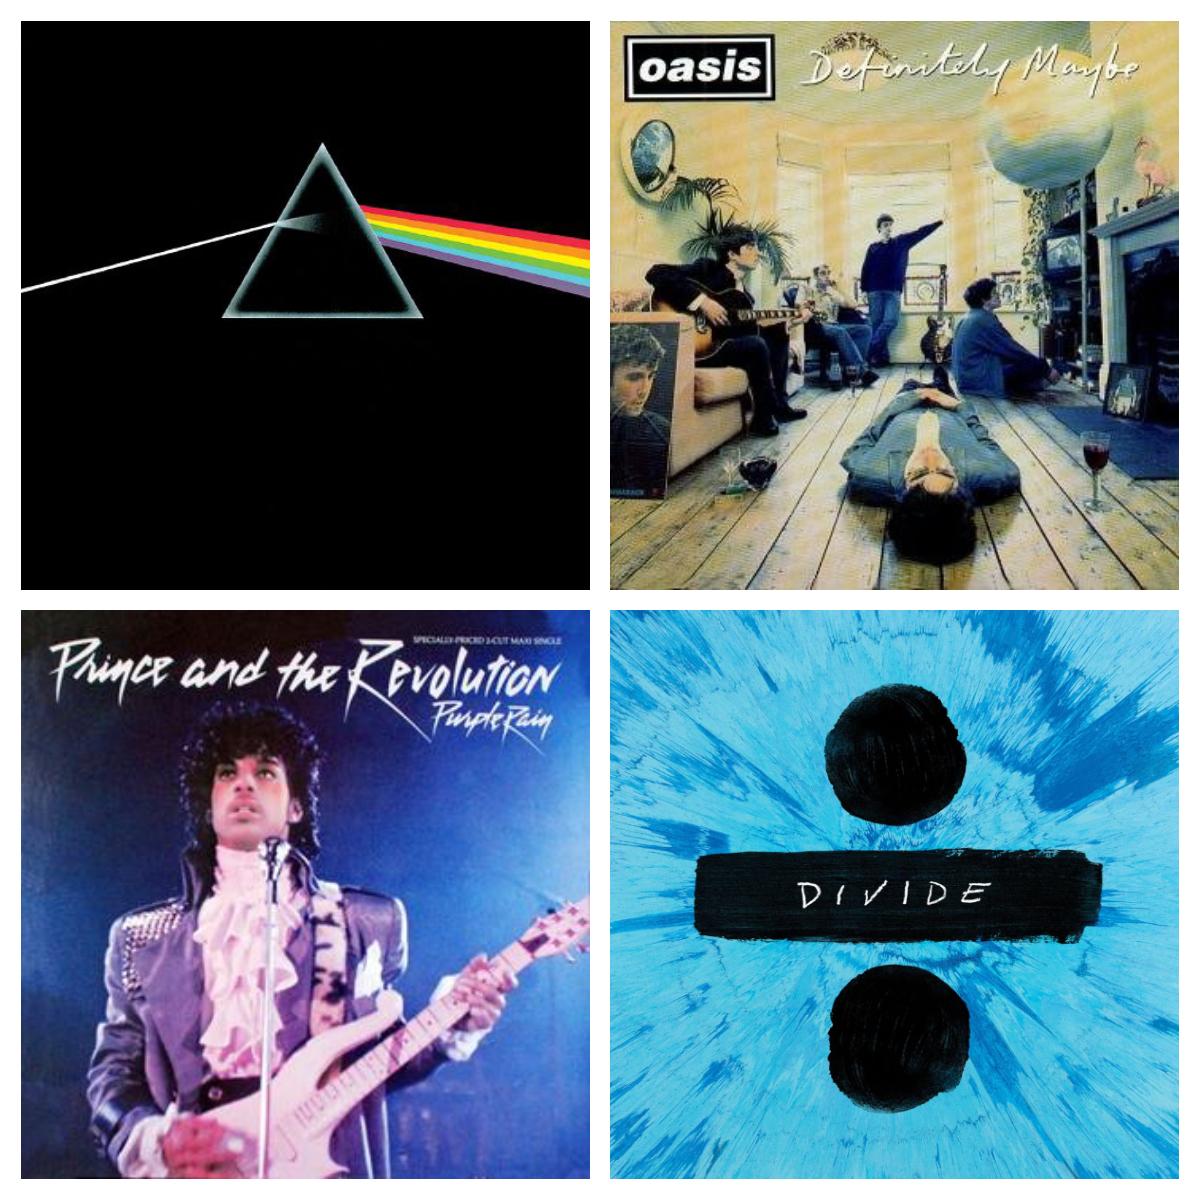 Home-Audio-Systems-Vinyl-Album-Covers-Pink-Floyd-Prince-Oasis-Ed-Sheeran